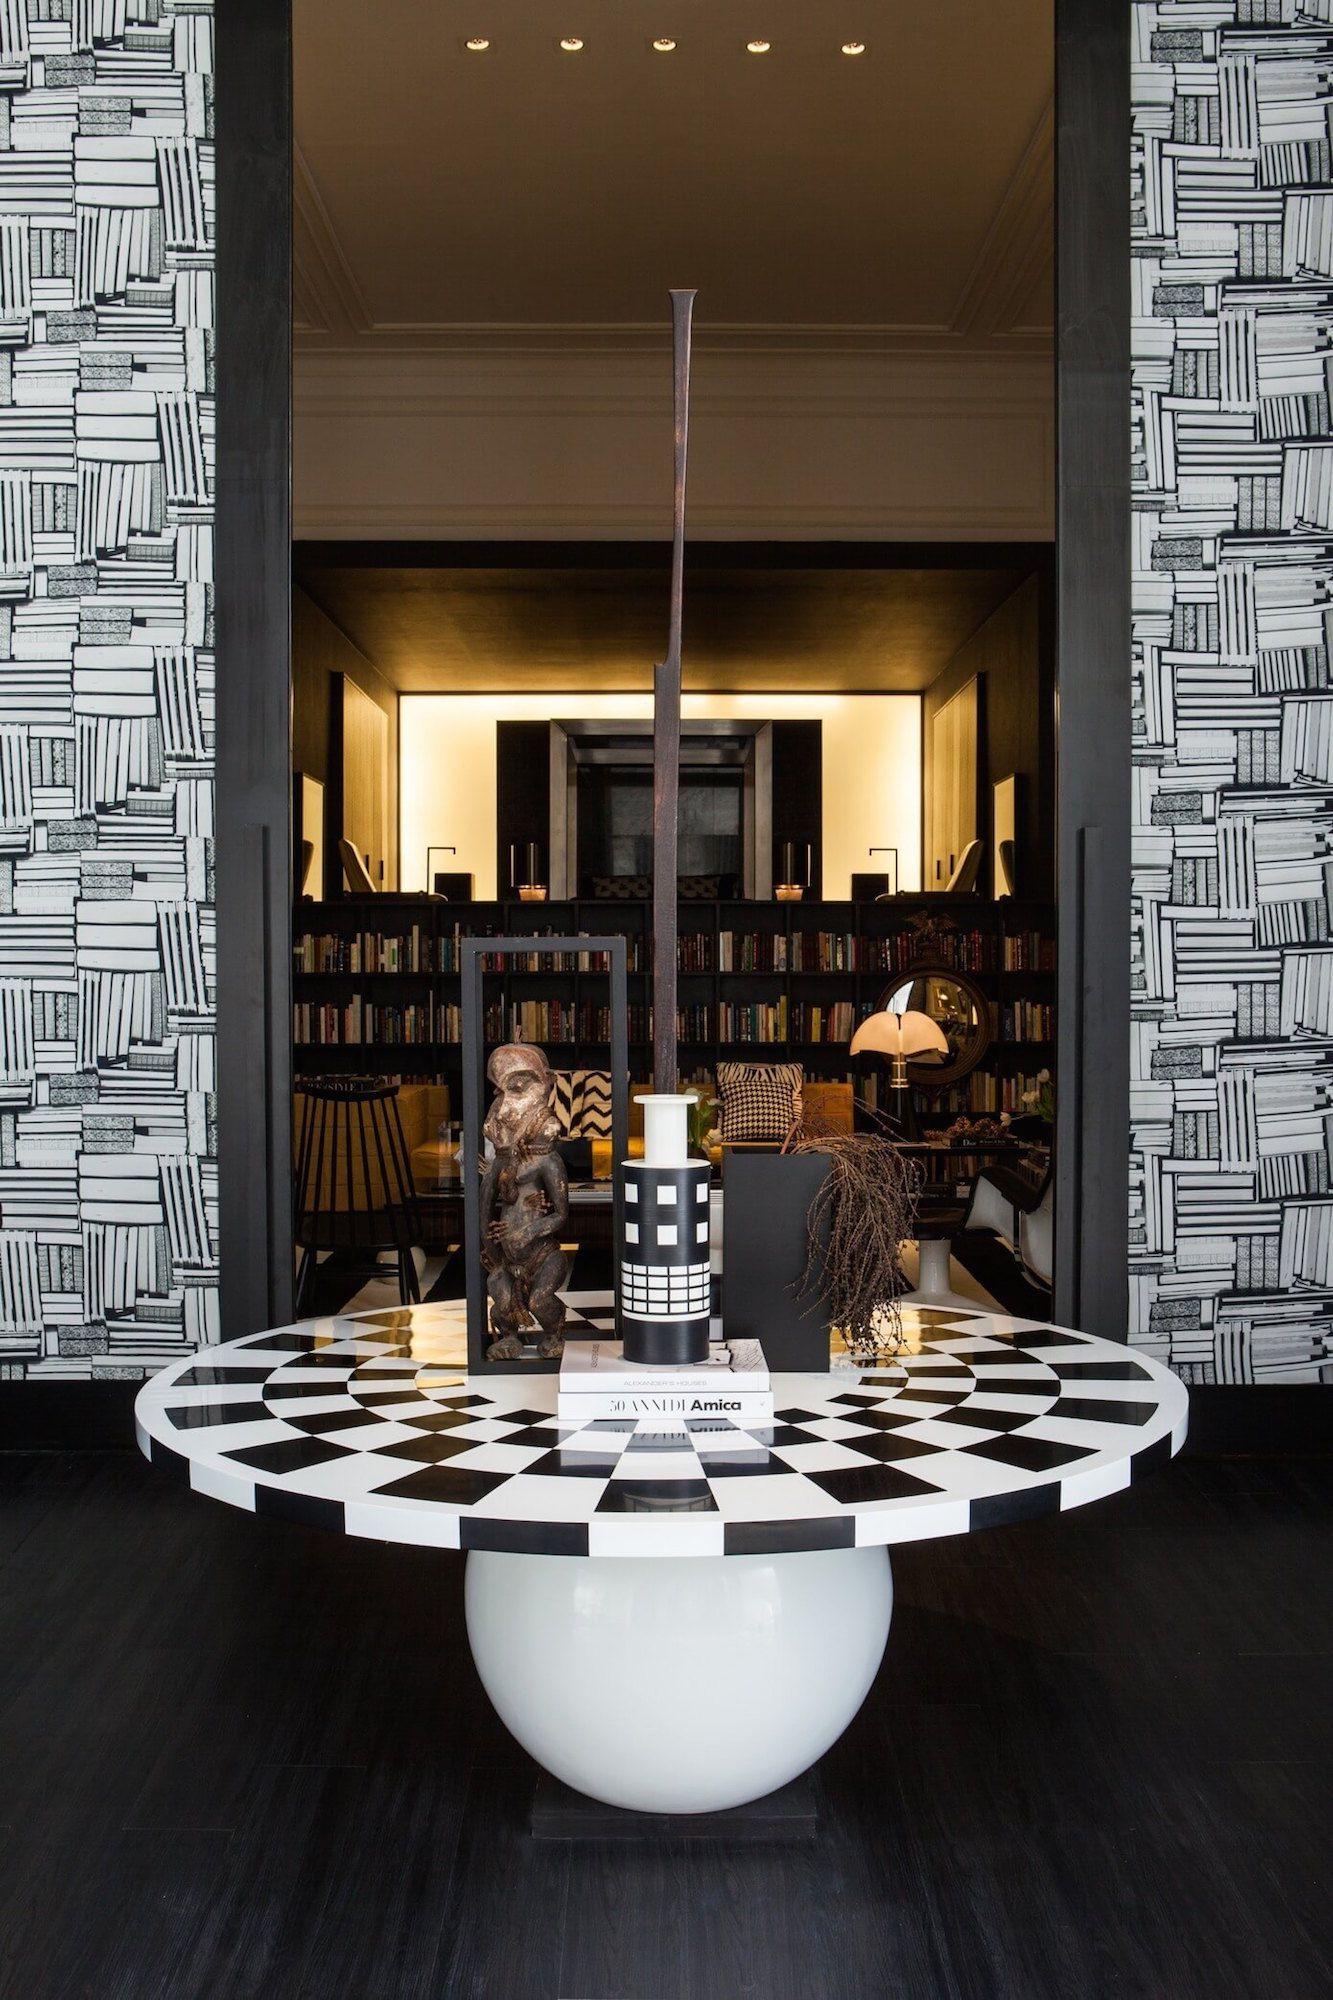 2015 Casa Cor Todeschini Pavilion-studio-guilherme-torres-25